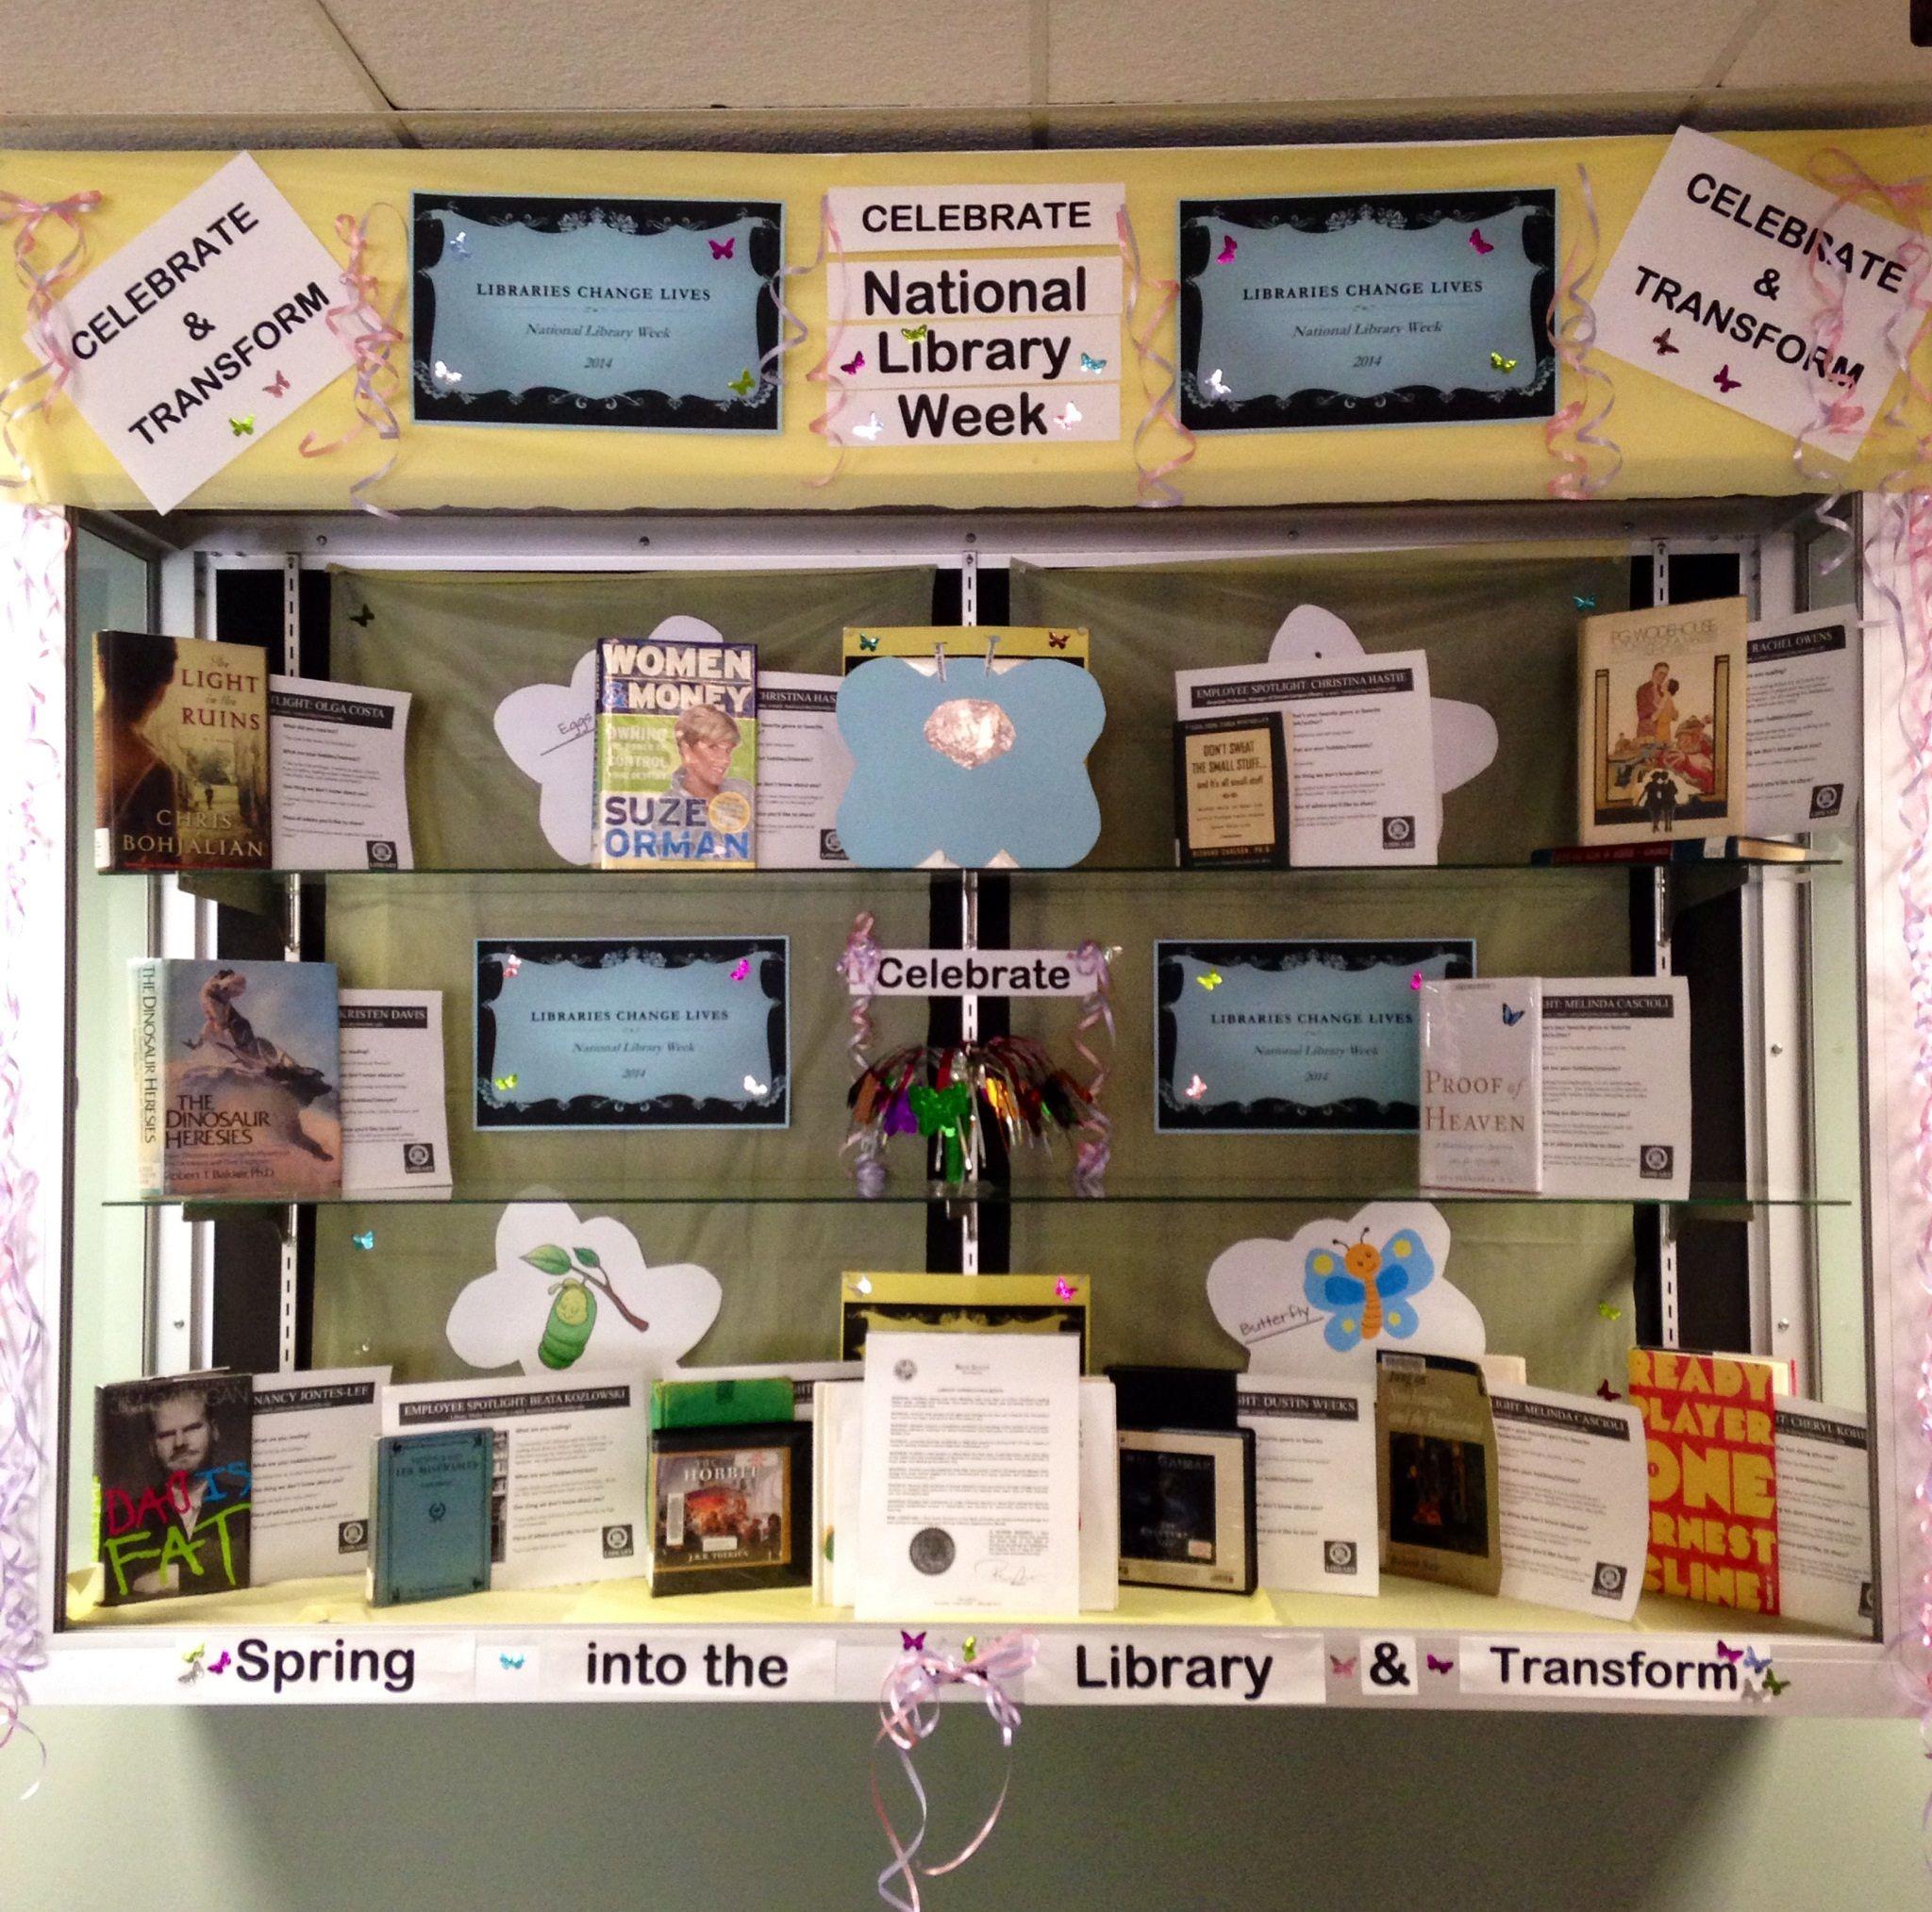 Display Ideas Re: April's 2014 National Library Week Display Case.